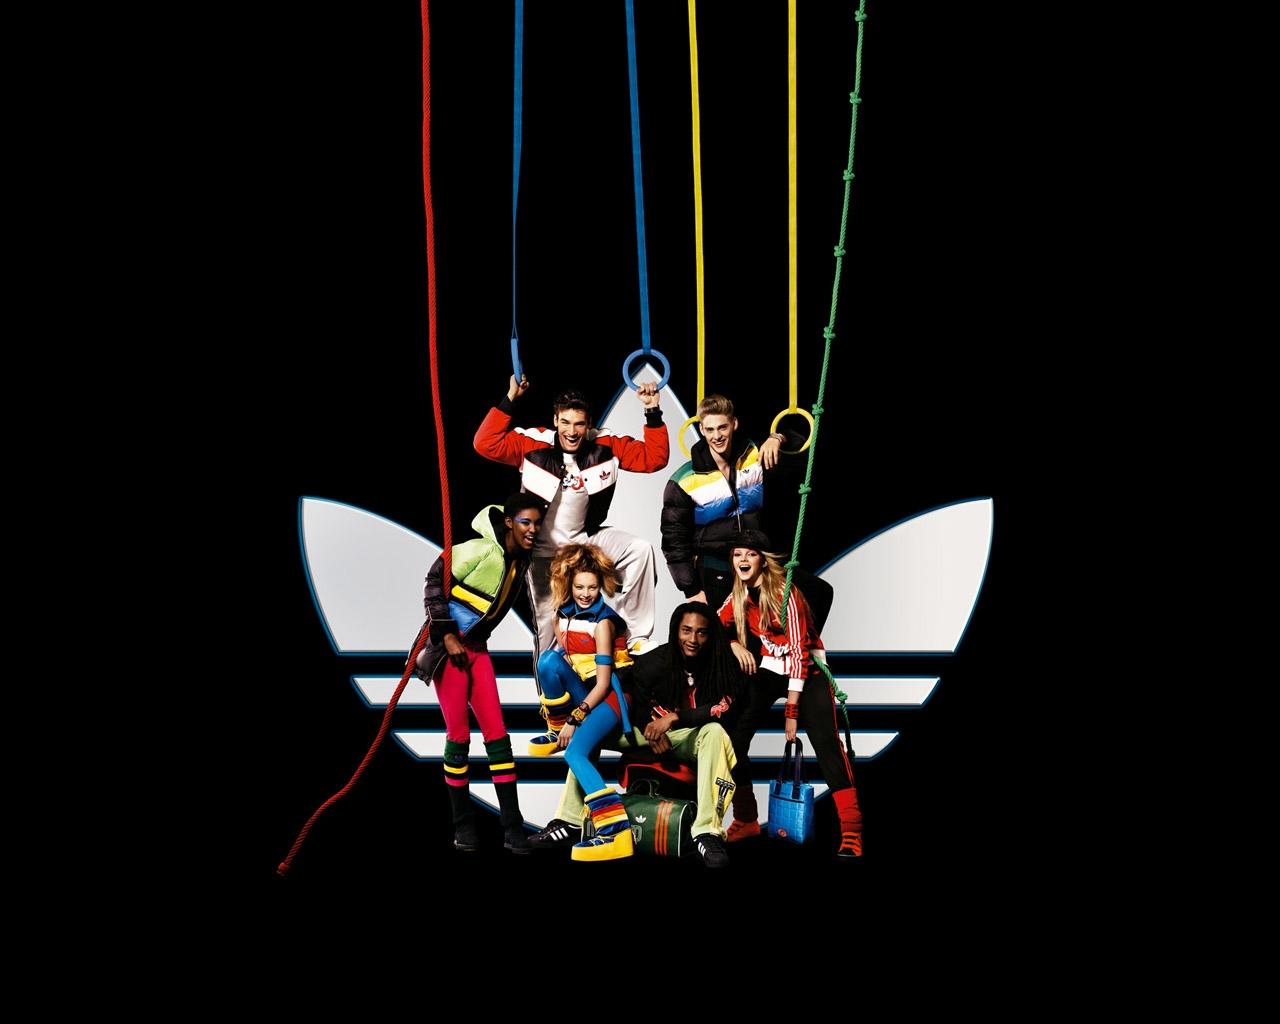 Wallpaper : Sports, People, Illustration, Logo, Cartoon